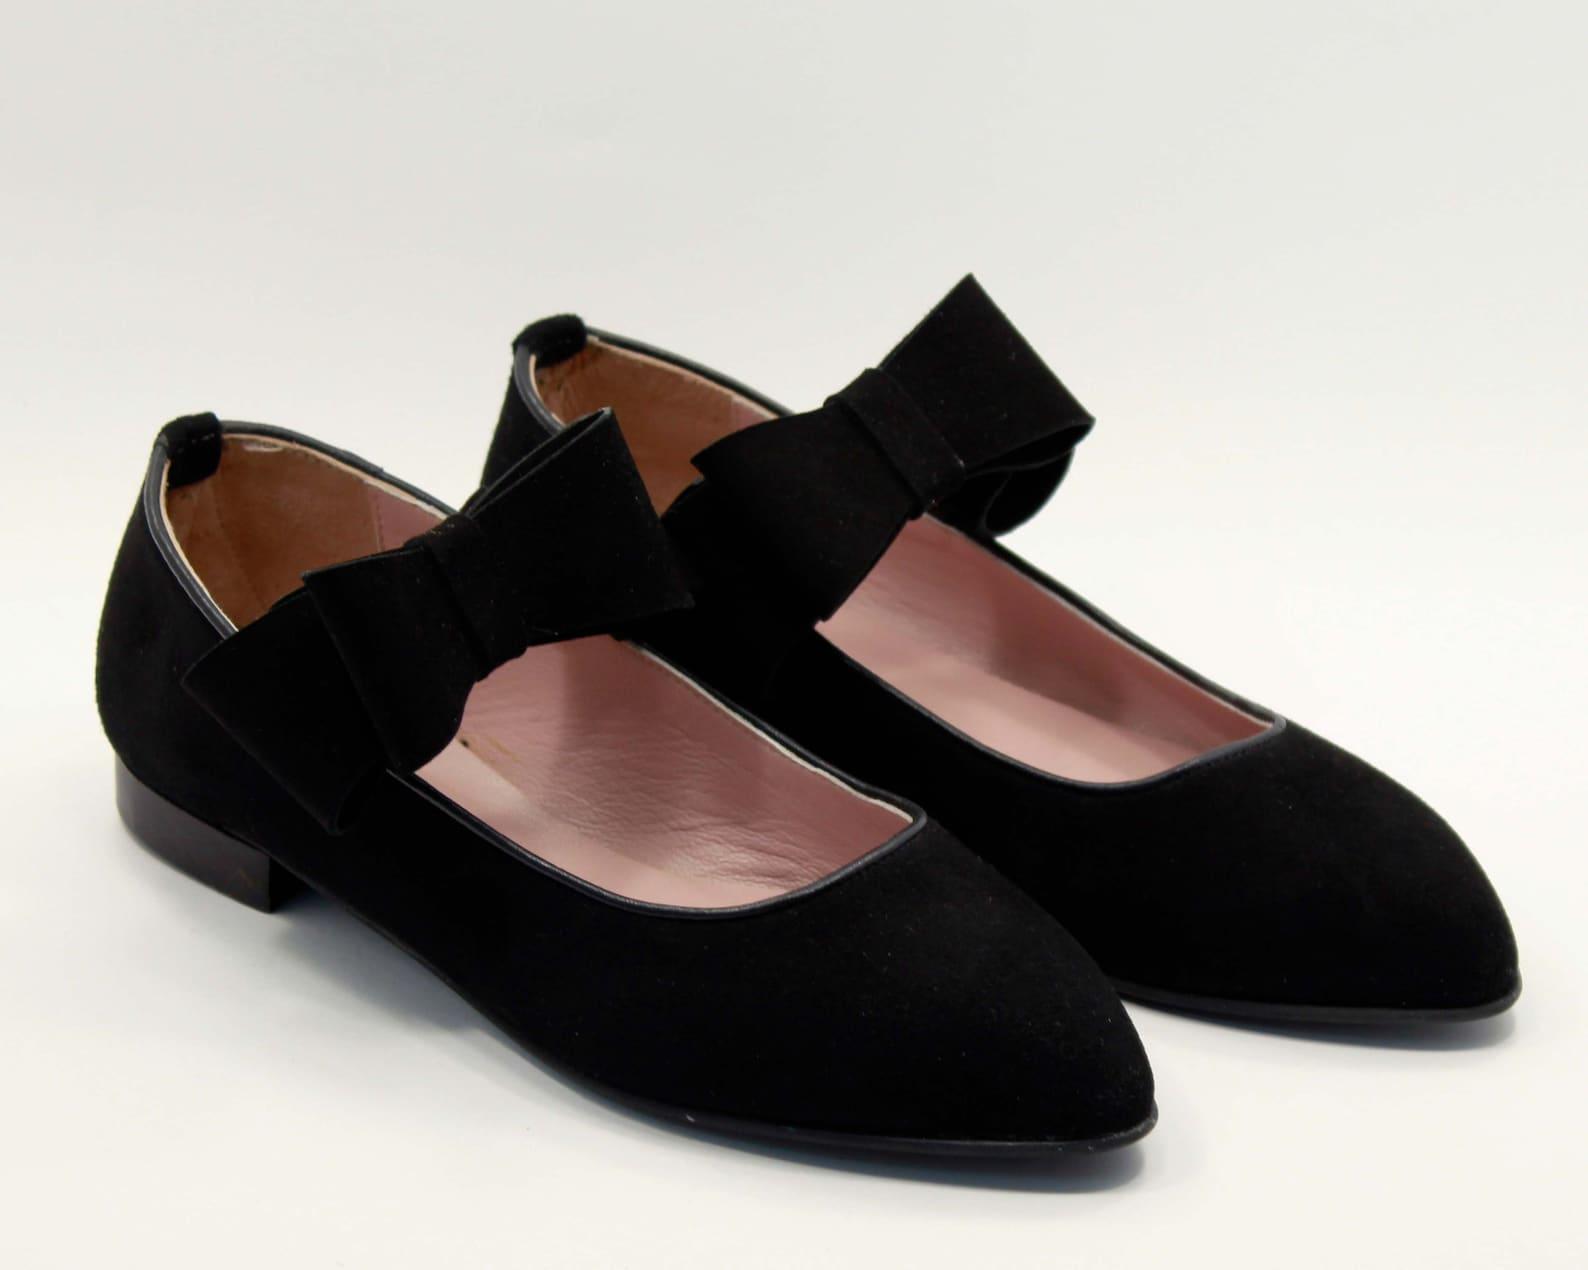 black women shoes flats black shoes bows ballerinas pink bows womens pink shoes nude ballet pink glitter flats handmade leather